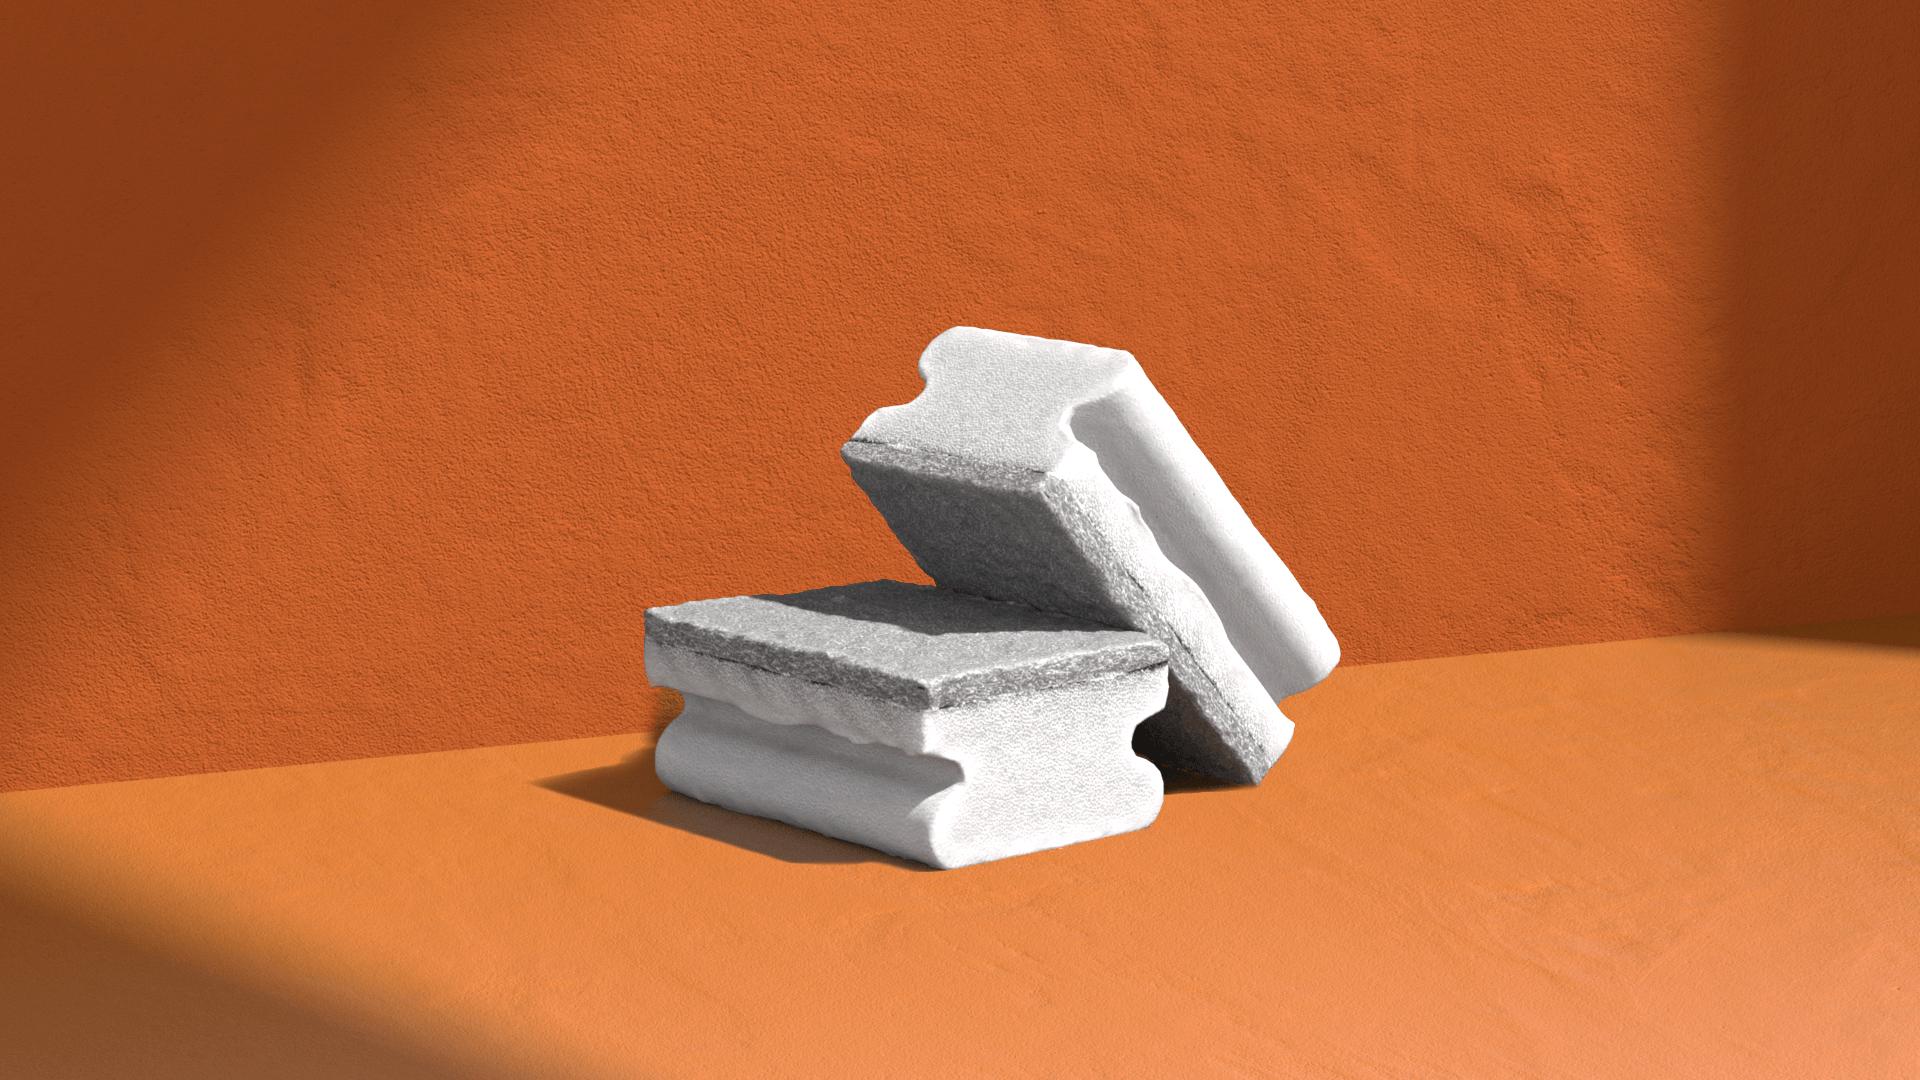 Plant Based Sponge